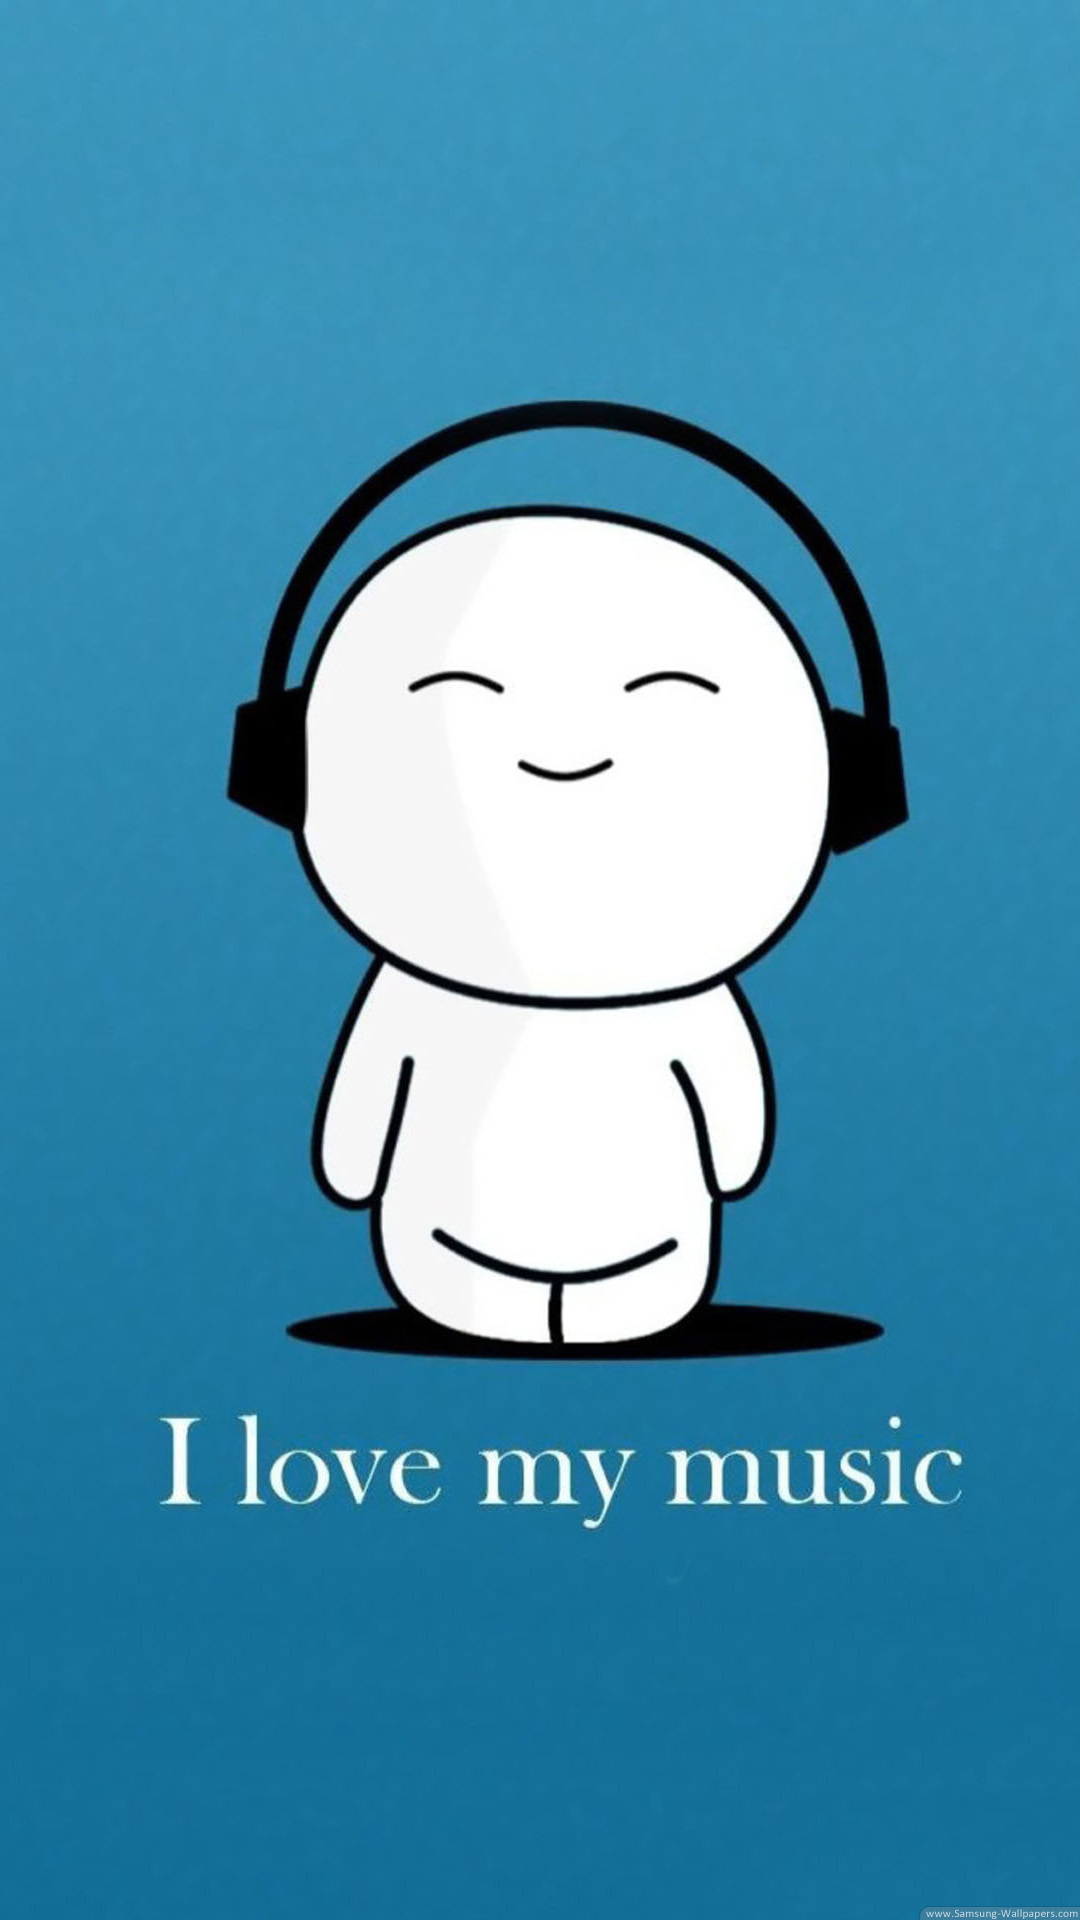 I Love My Music Iphone 6 Wallpaper Ilikewallpaper Com